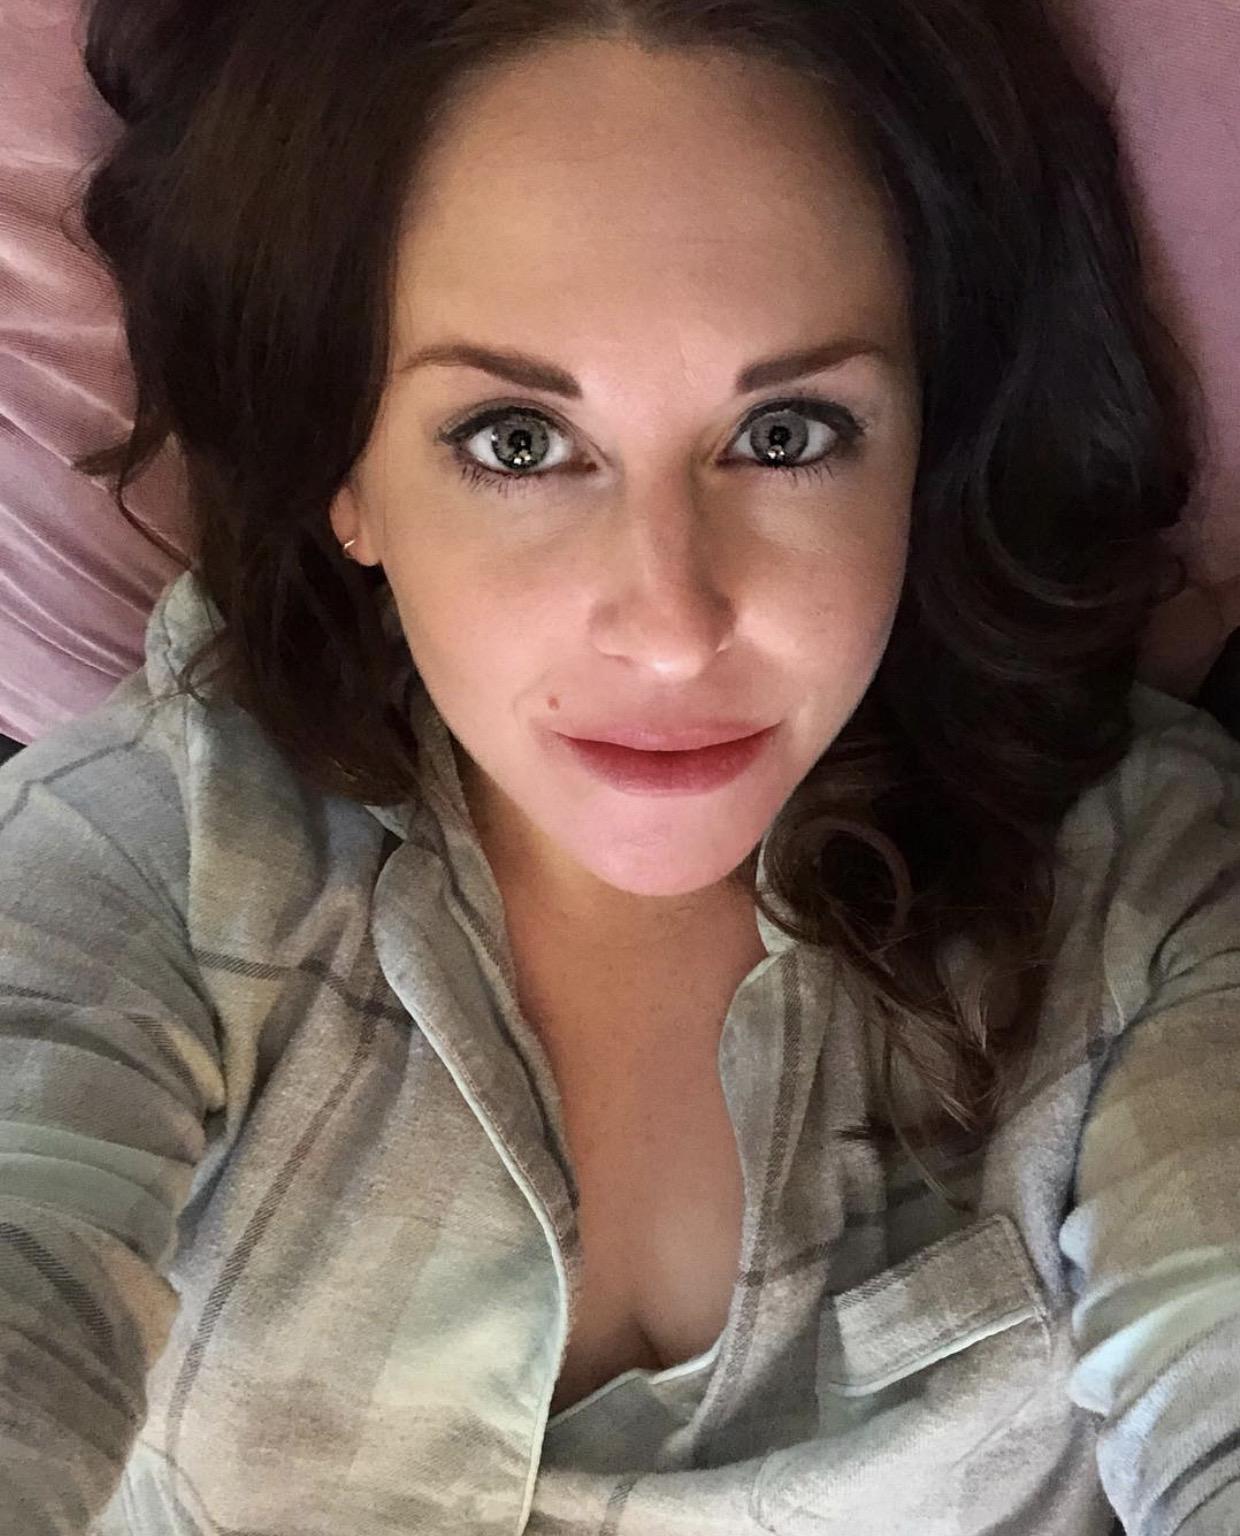 Kara Gammell, financial journalist and blogger at www.yourbestfriendsguidetocash.co.uk